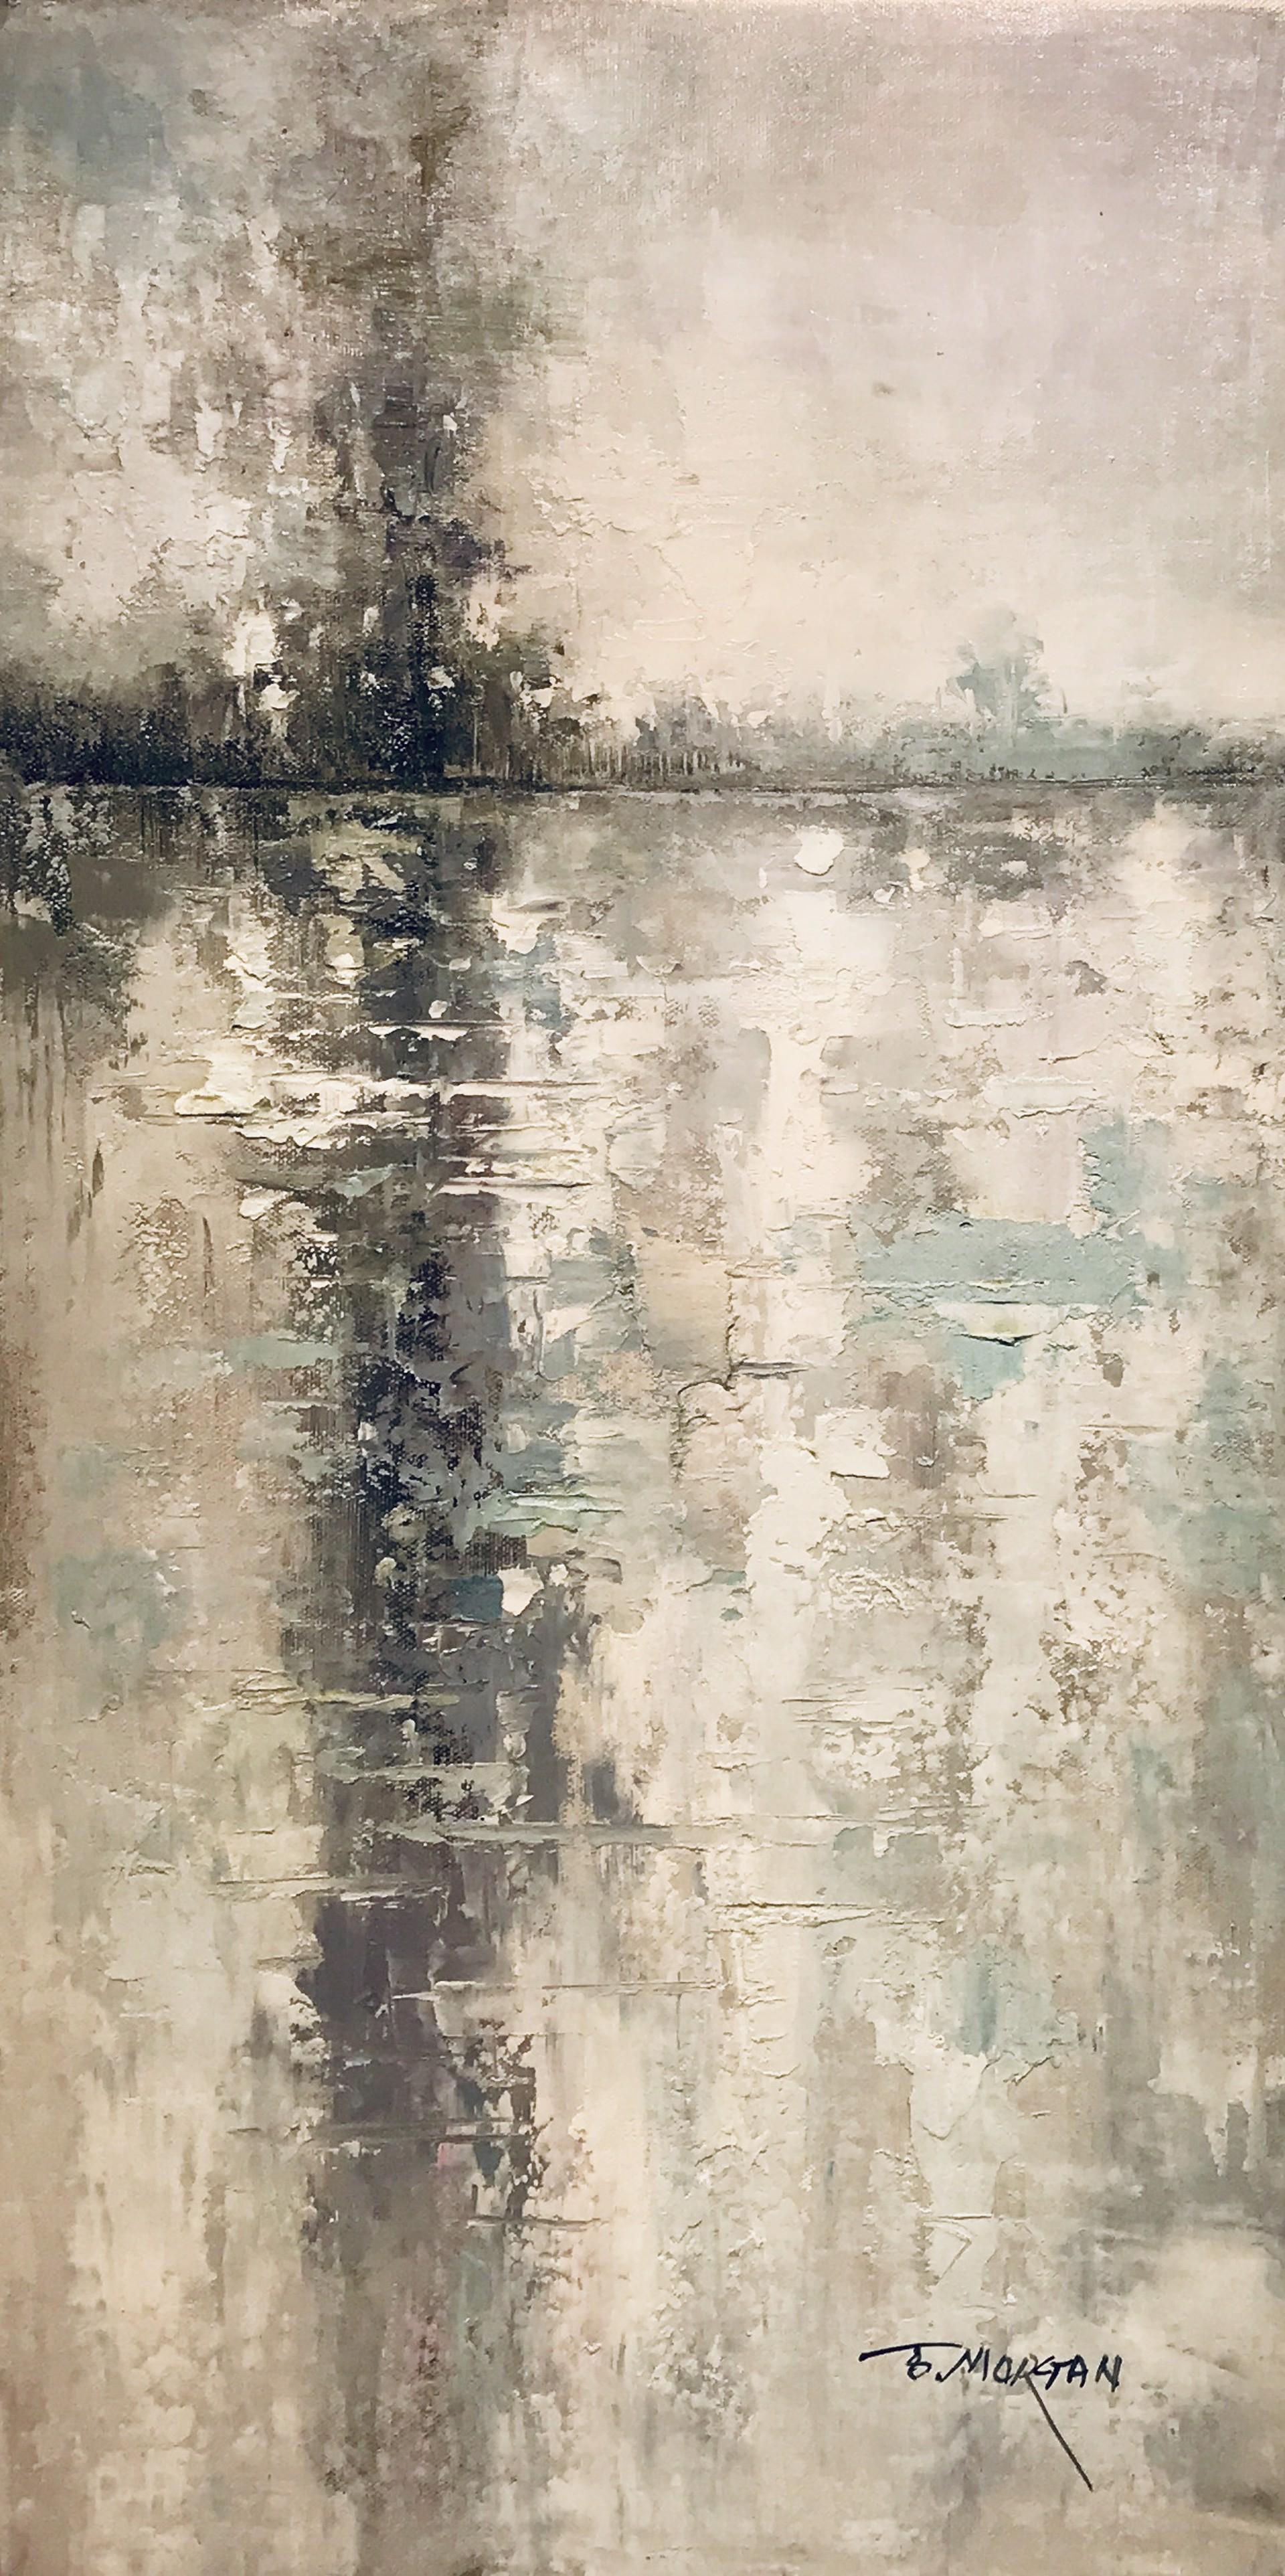 LOOSE REFLECTION by J MORGAN